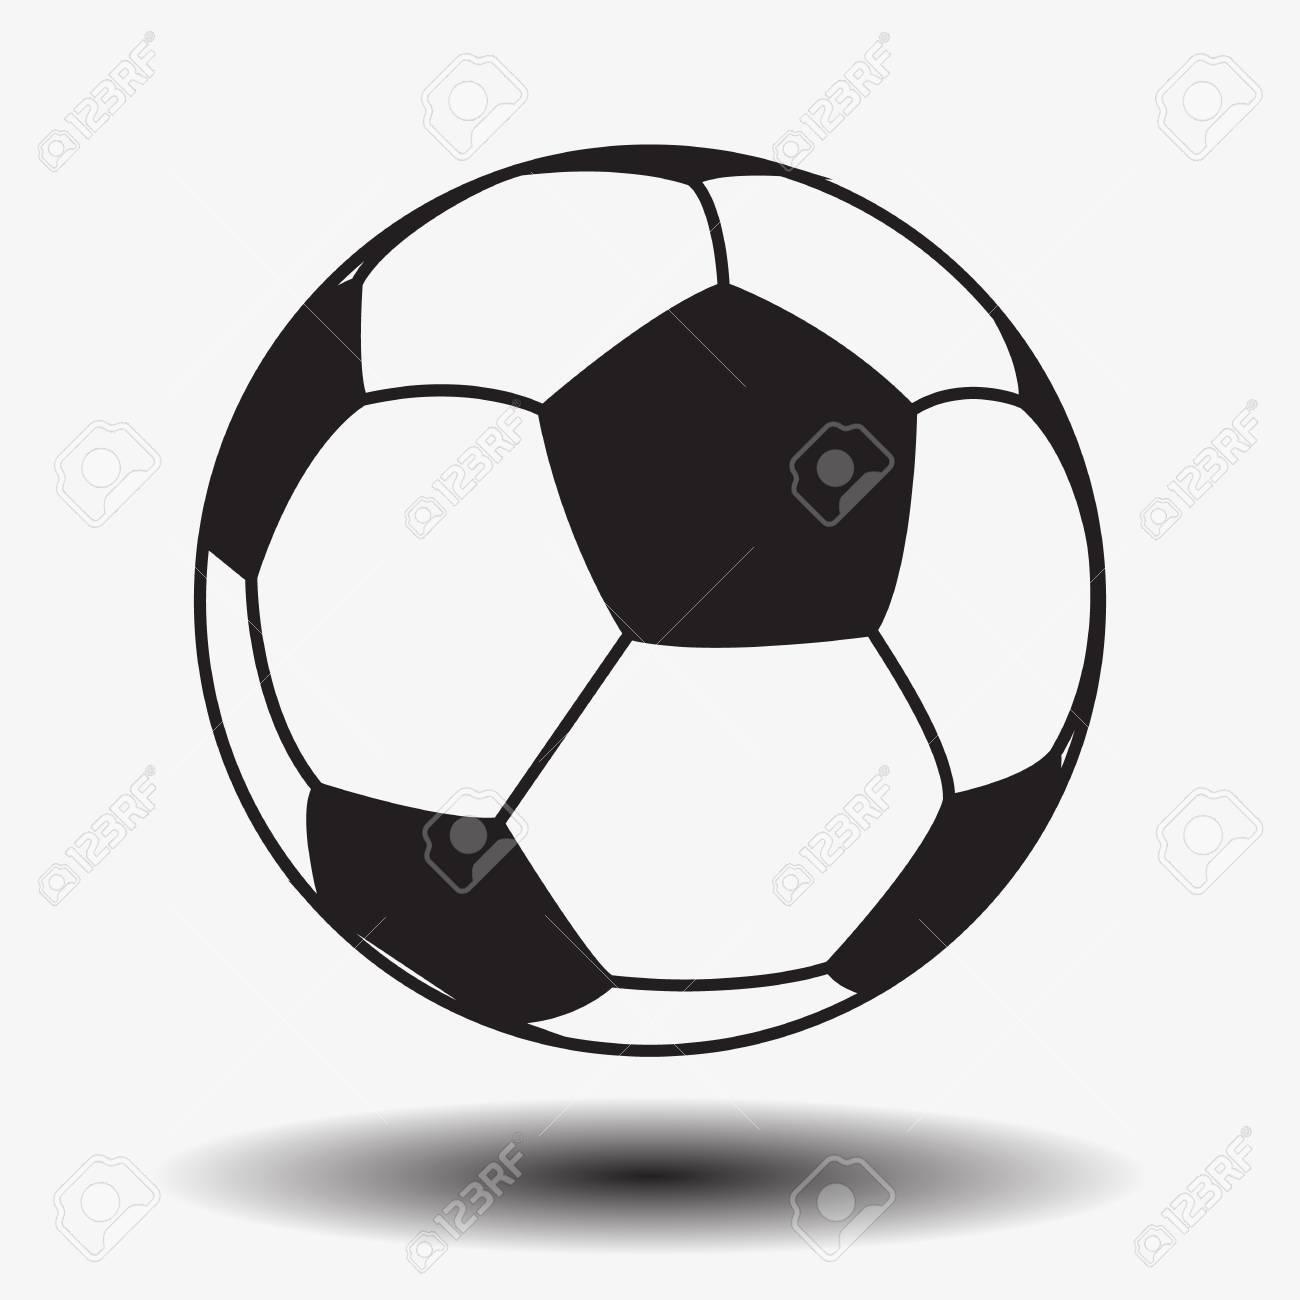 Fútbol. Fútbol. Balón De Fútbol De Cuero Aislado Sobre Fondo Blanco ...